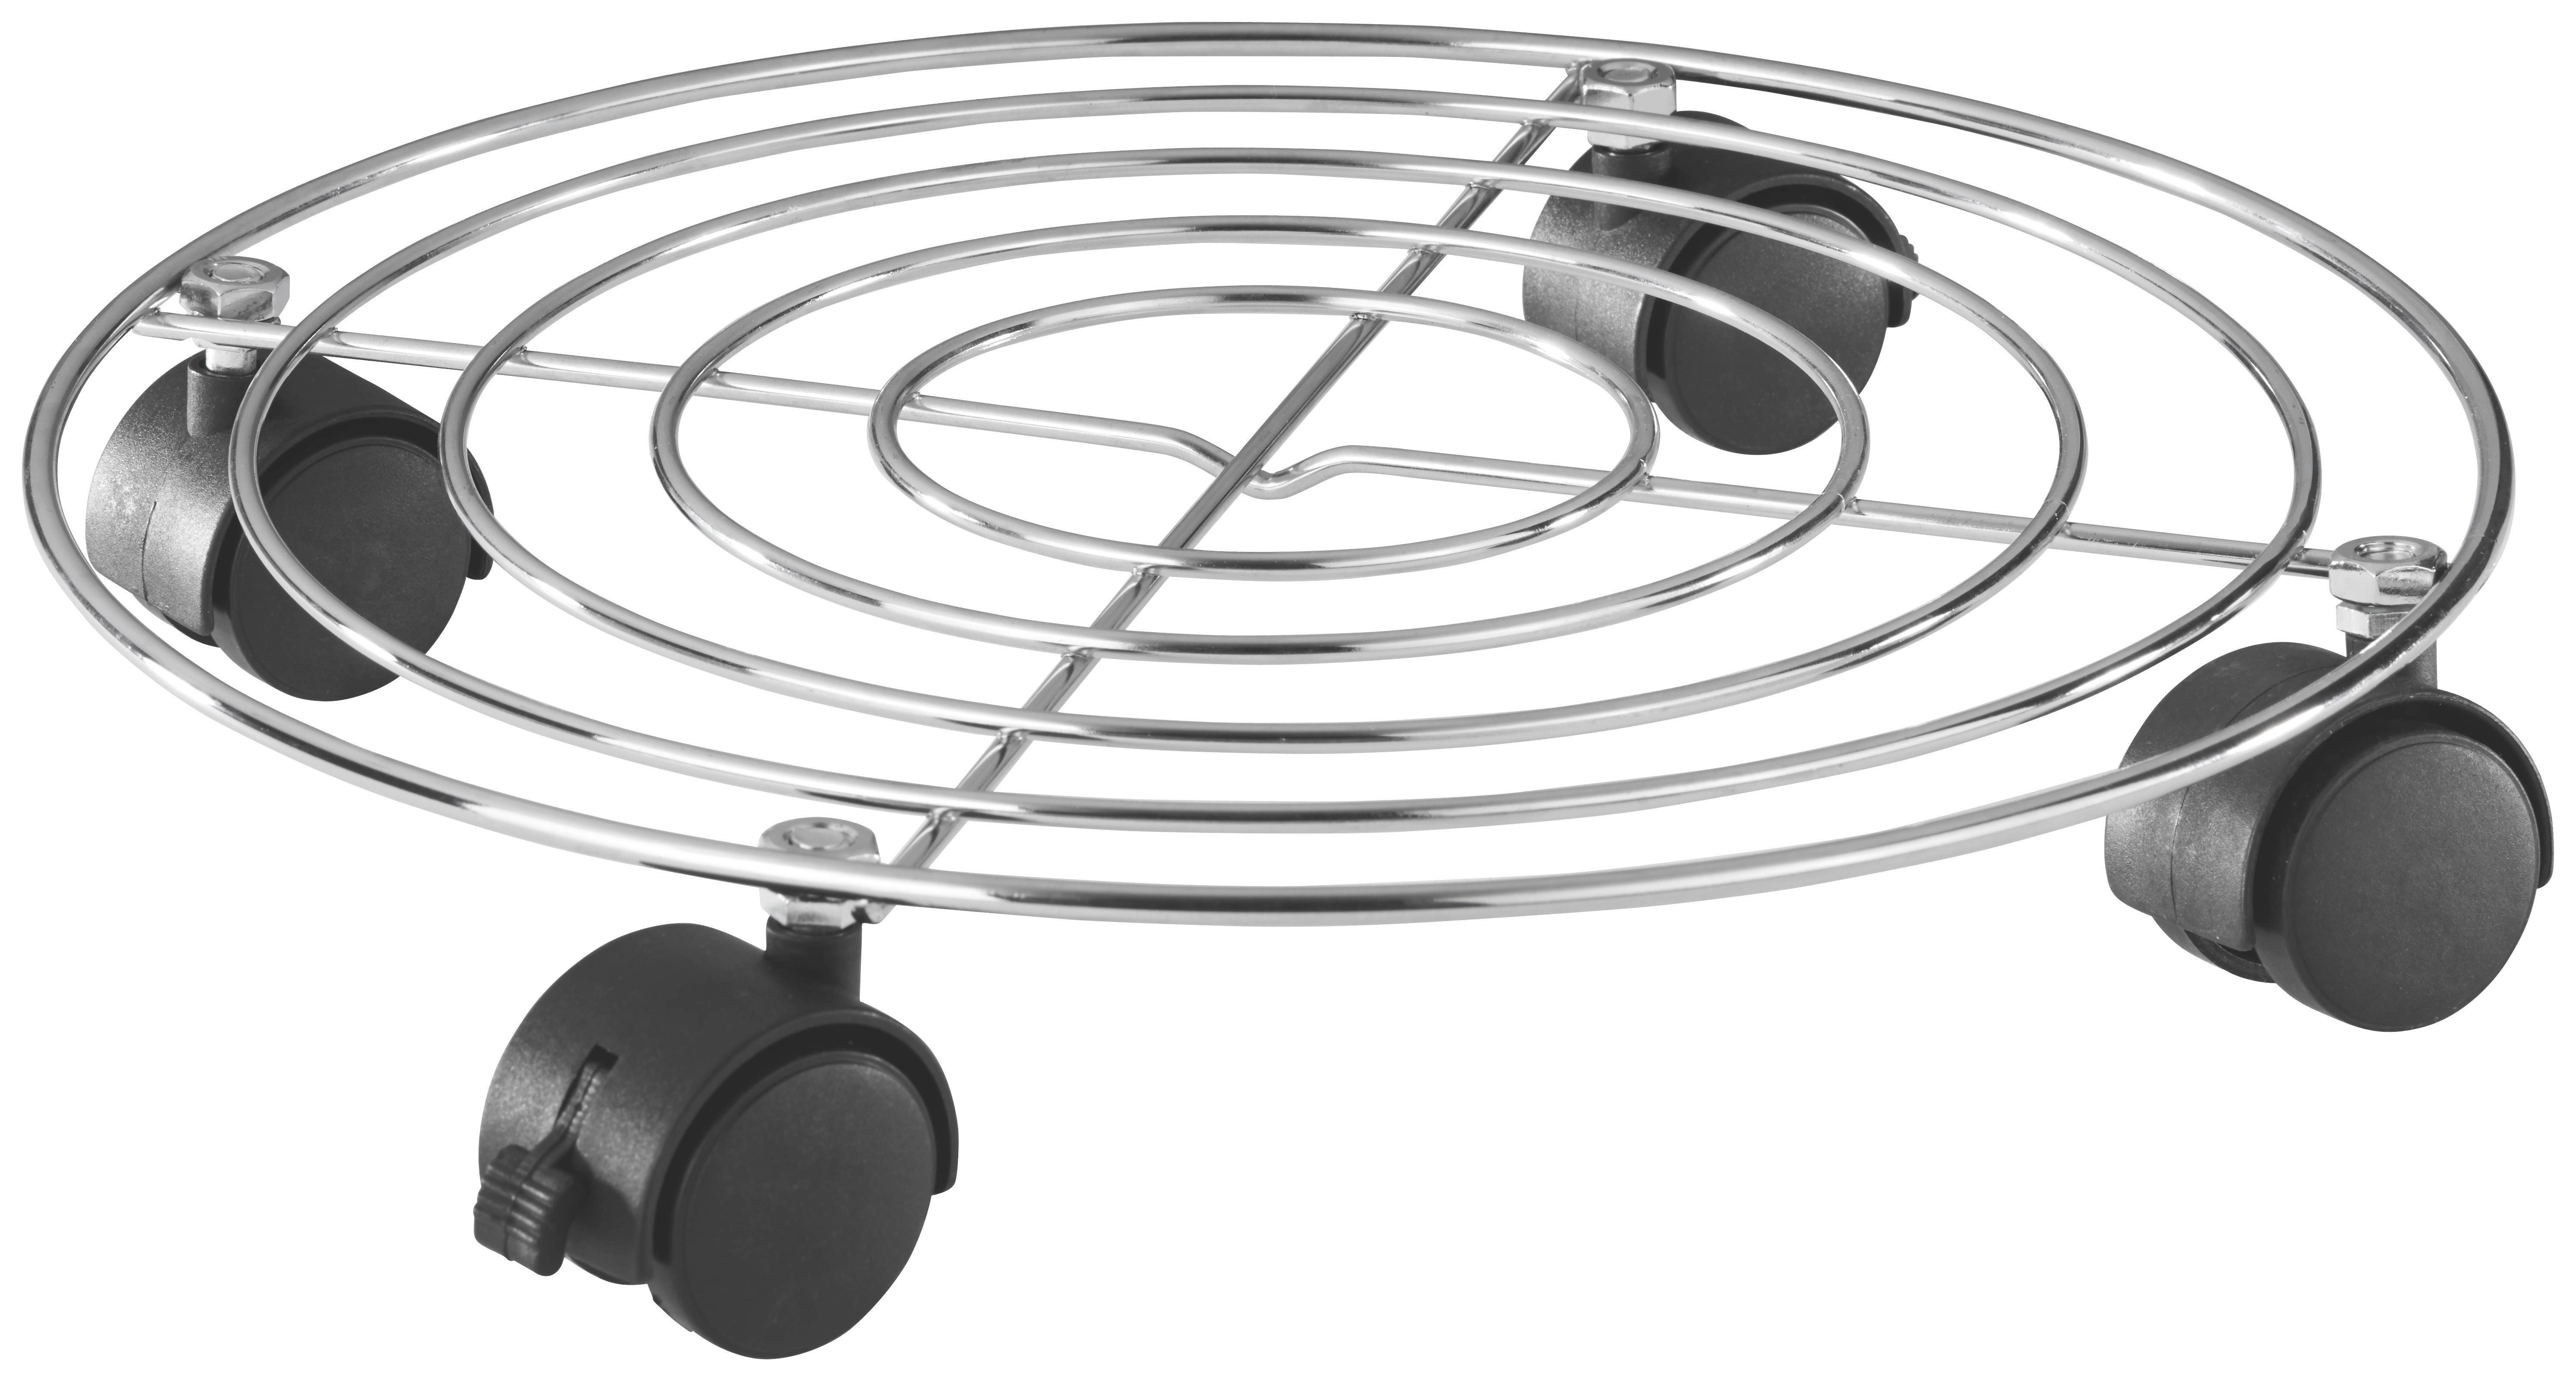 Pflanzengitter Moritz aus Metall - Kunststoff/Metall (33/6cm) - MÖMAX modern living